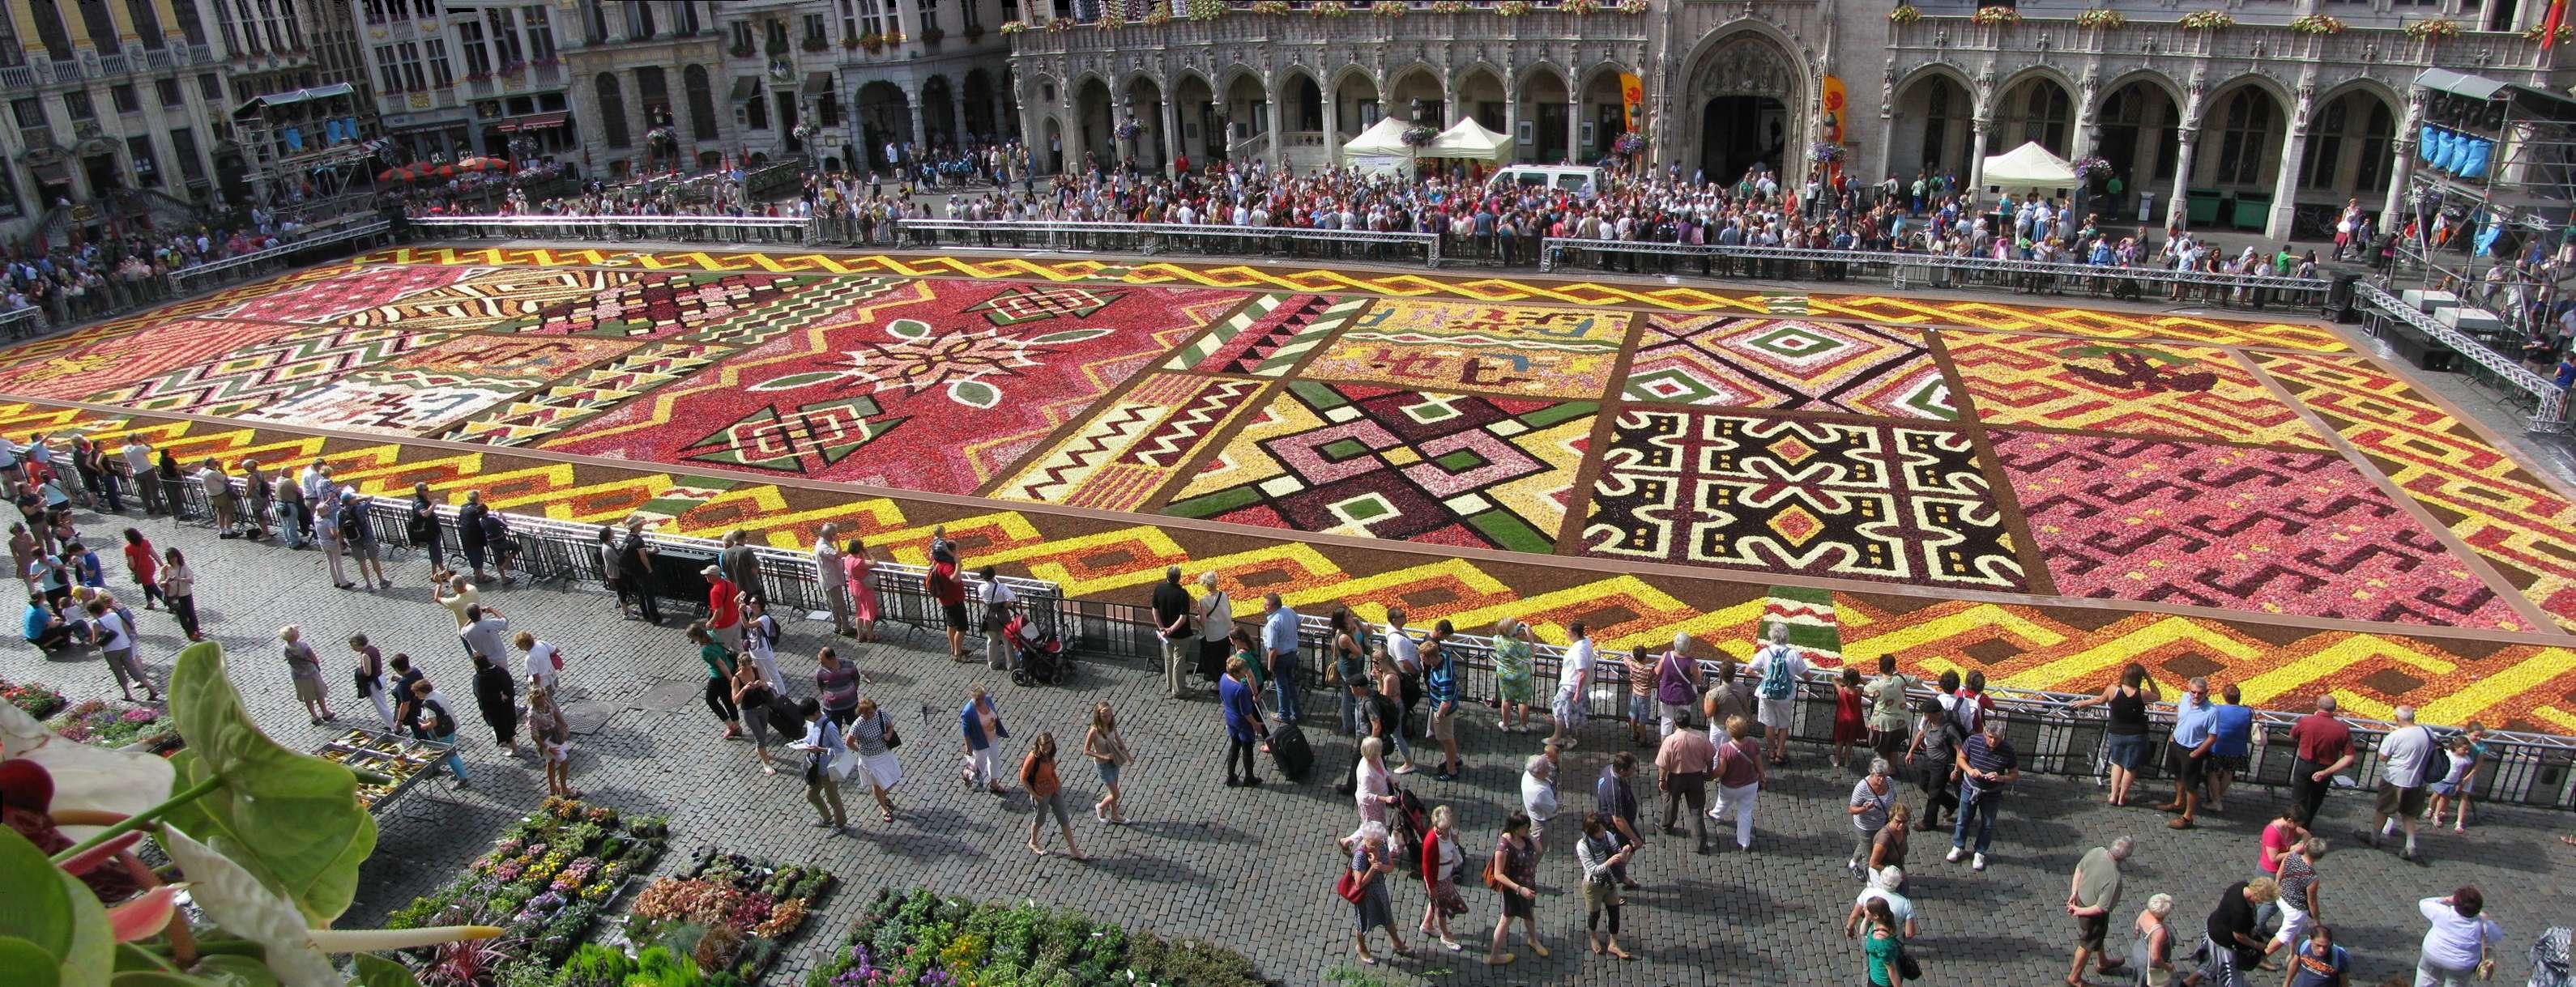 https commons wikimedia org wiki file bruxelles grand place tapis de fleurs en 2012 panoramio jpg